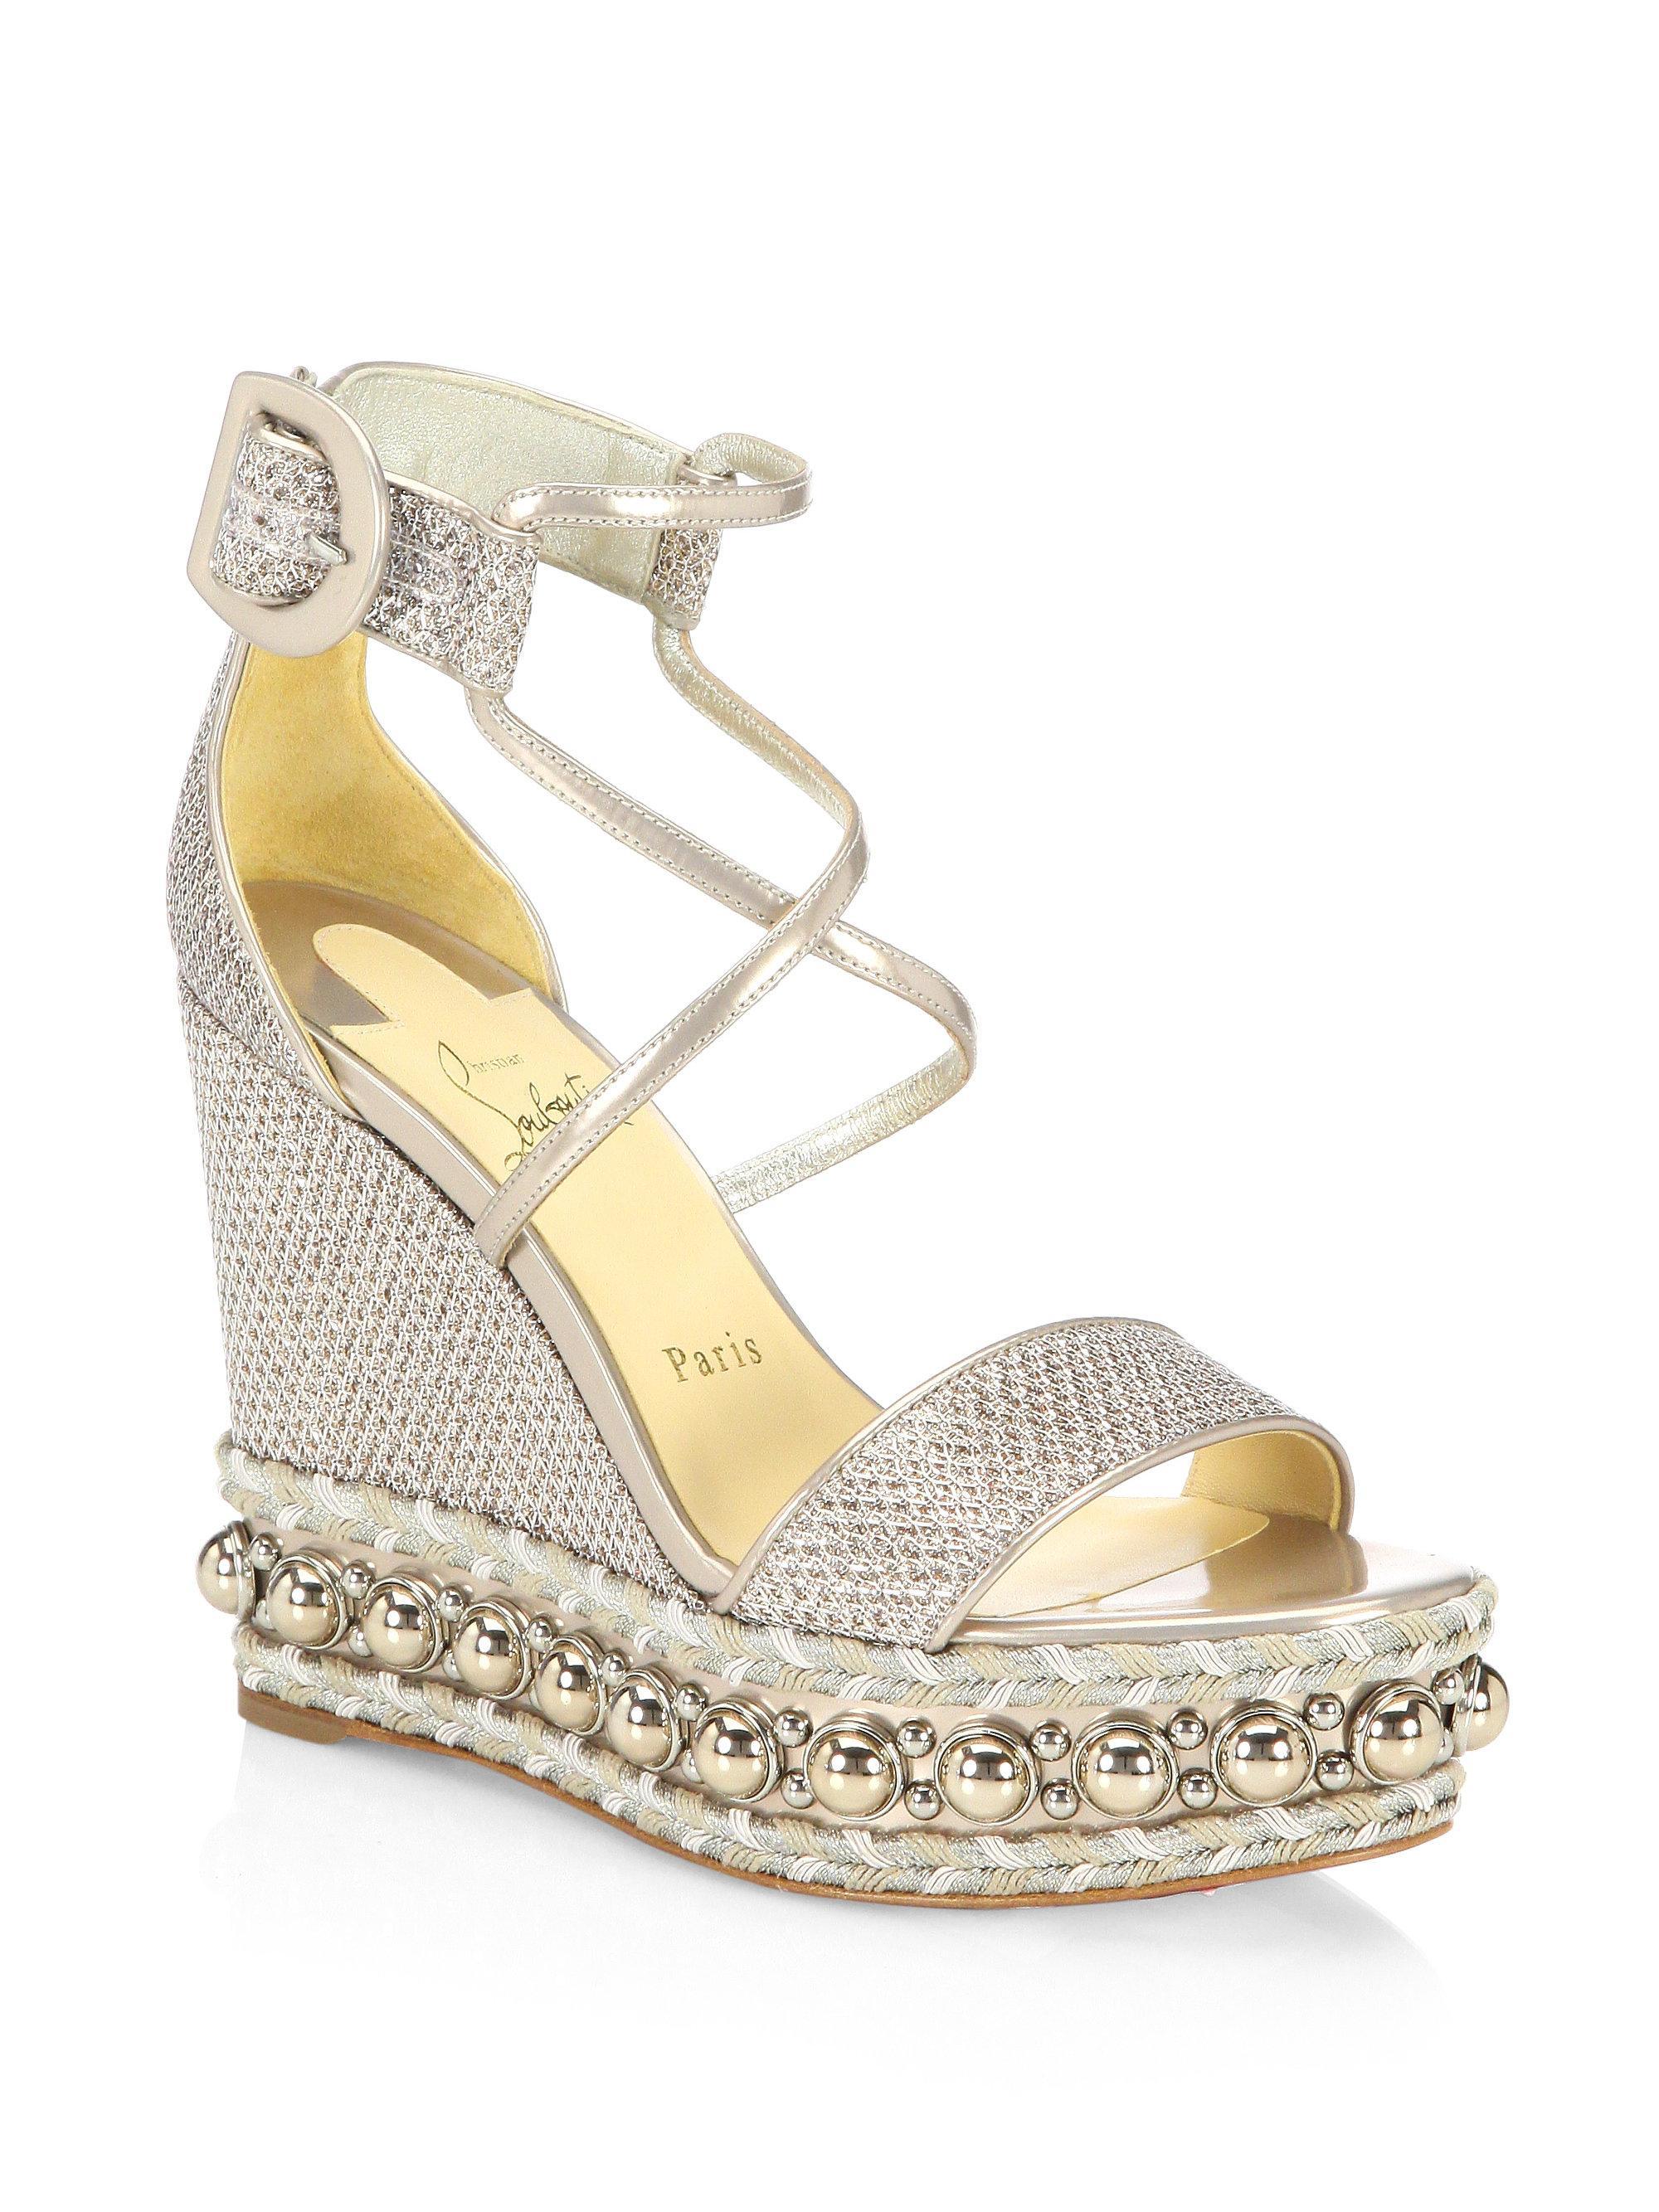 a4d995d1d1b Christian Louboutin Chocazeppa Wedge Sandals in Natural - Lyst